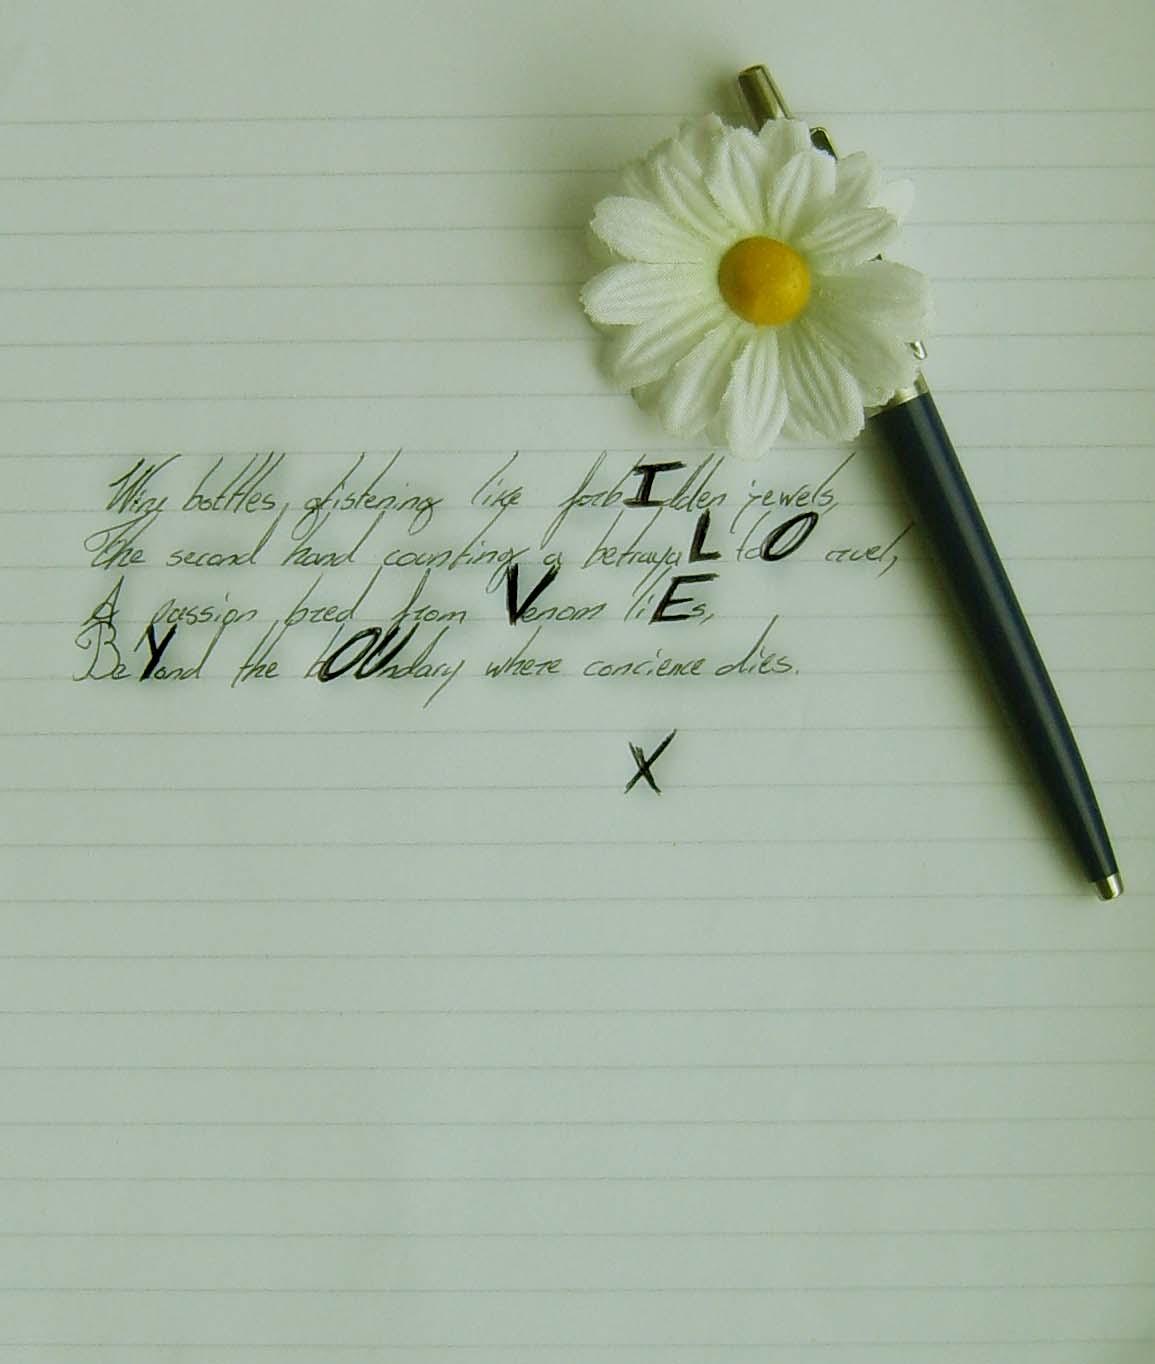 красивое письмо мужчине для знакомства